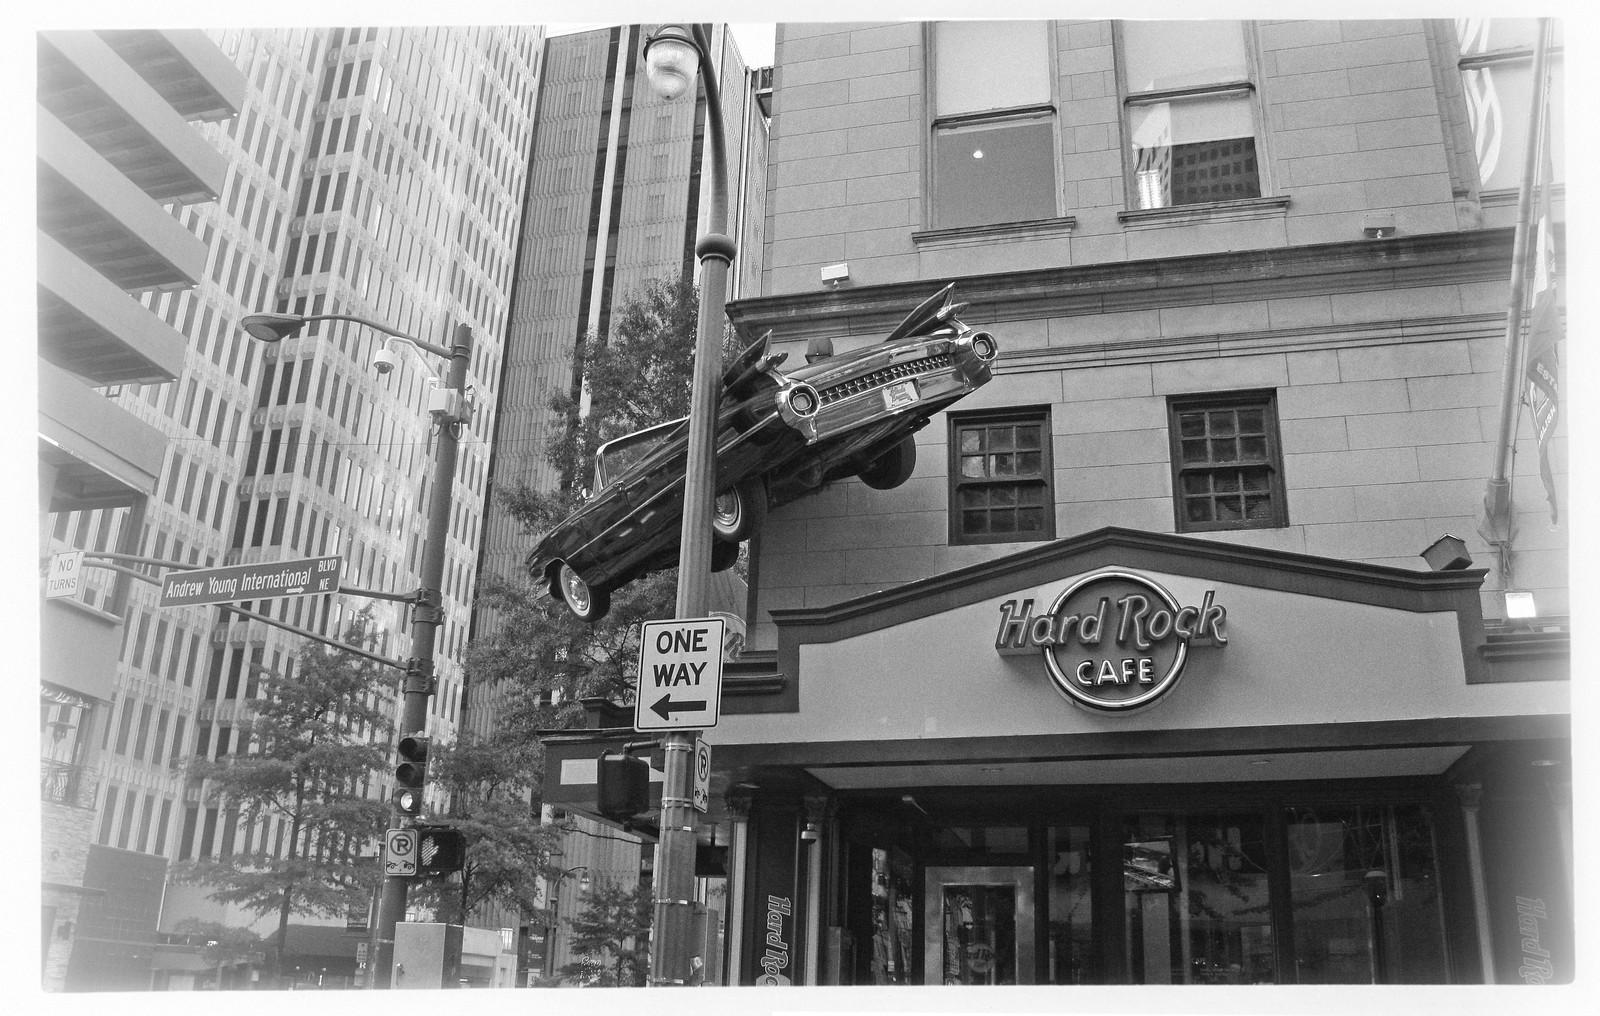 Hard Rock Cafe, Atlanta